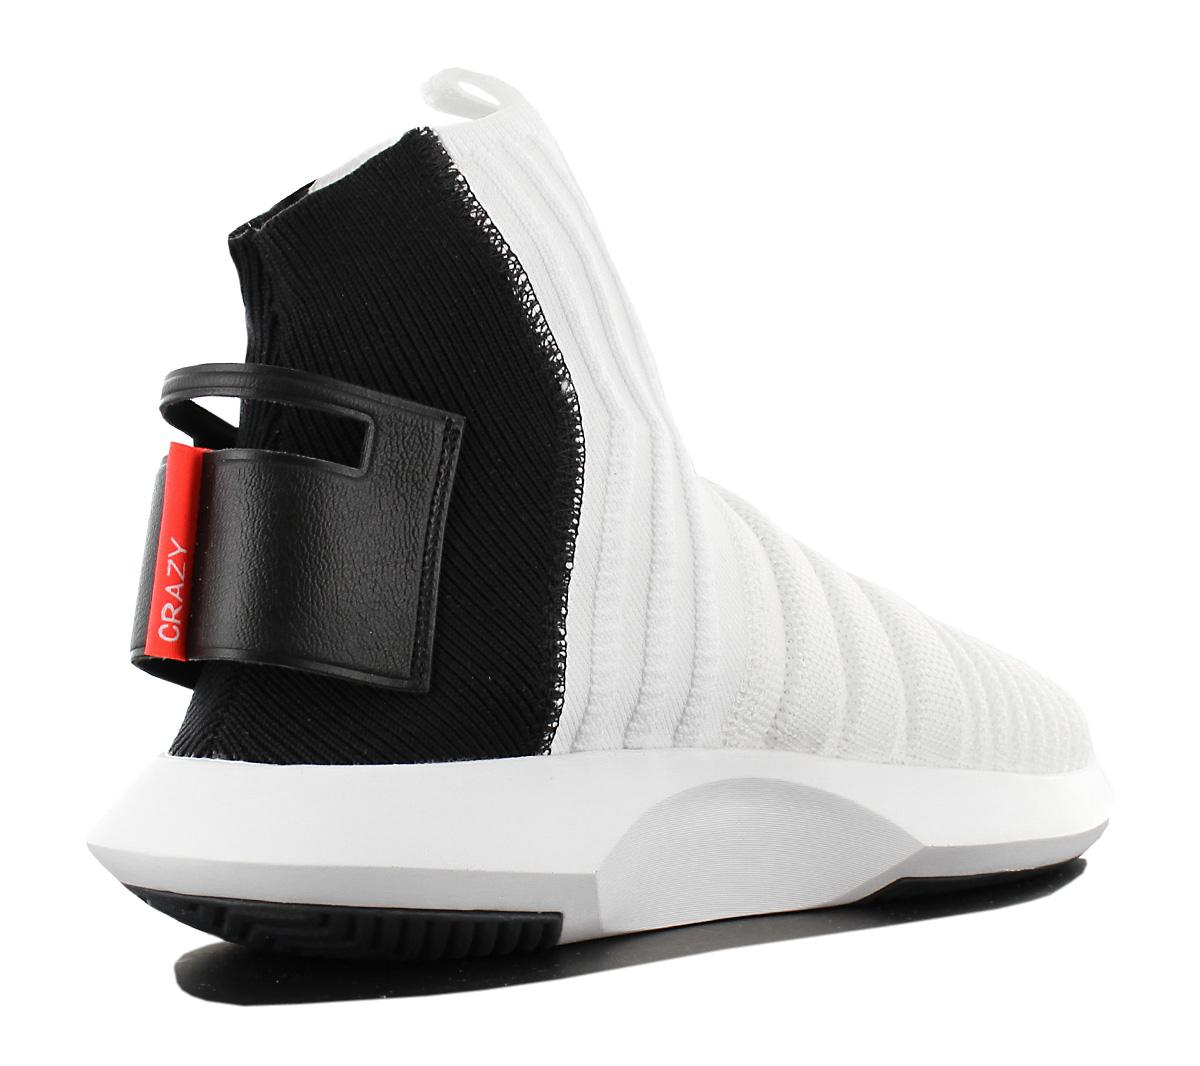 hot sale online bcc9b 77c5b Adidas Crazy 1 Adv Sock Pk Primeknit Mens Sneakers Basketbal